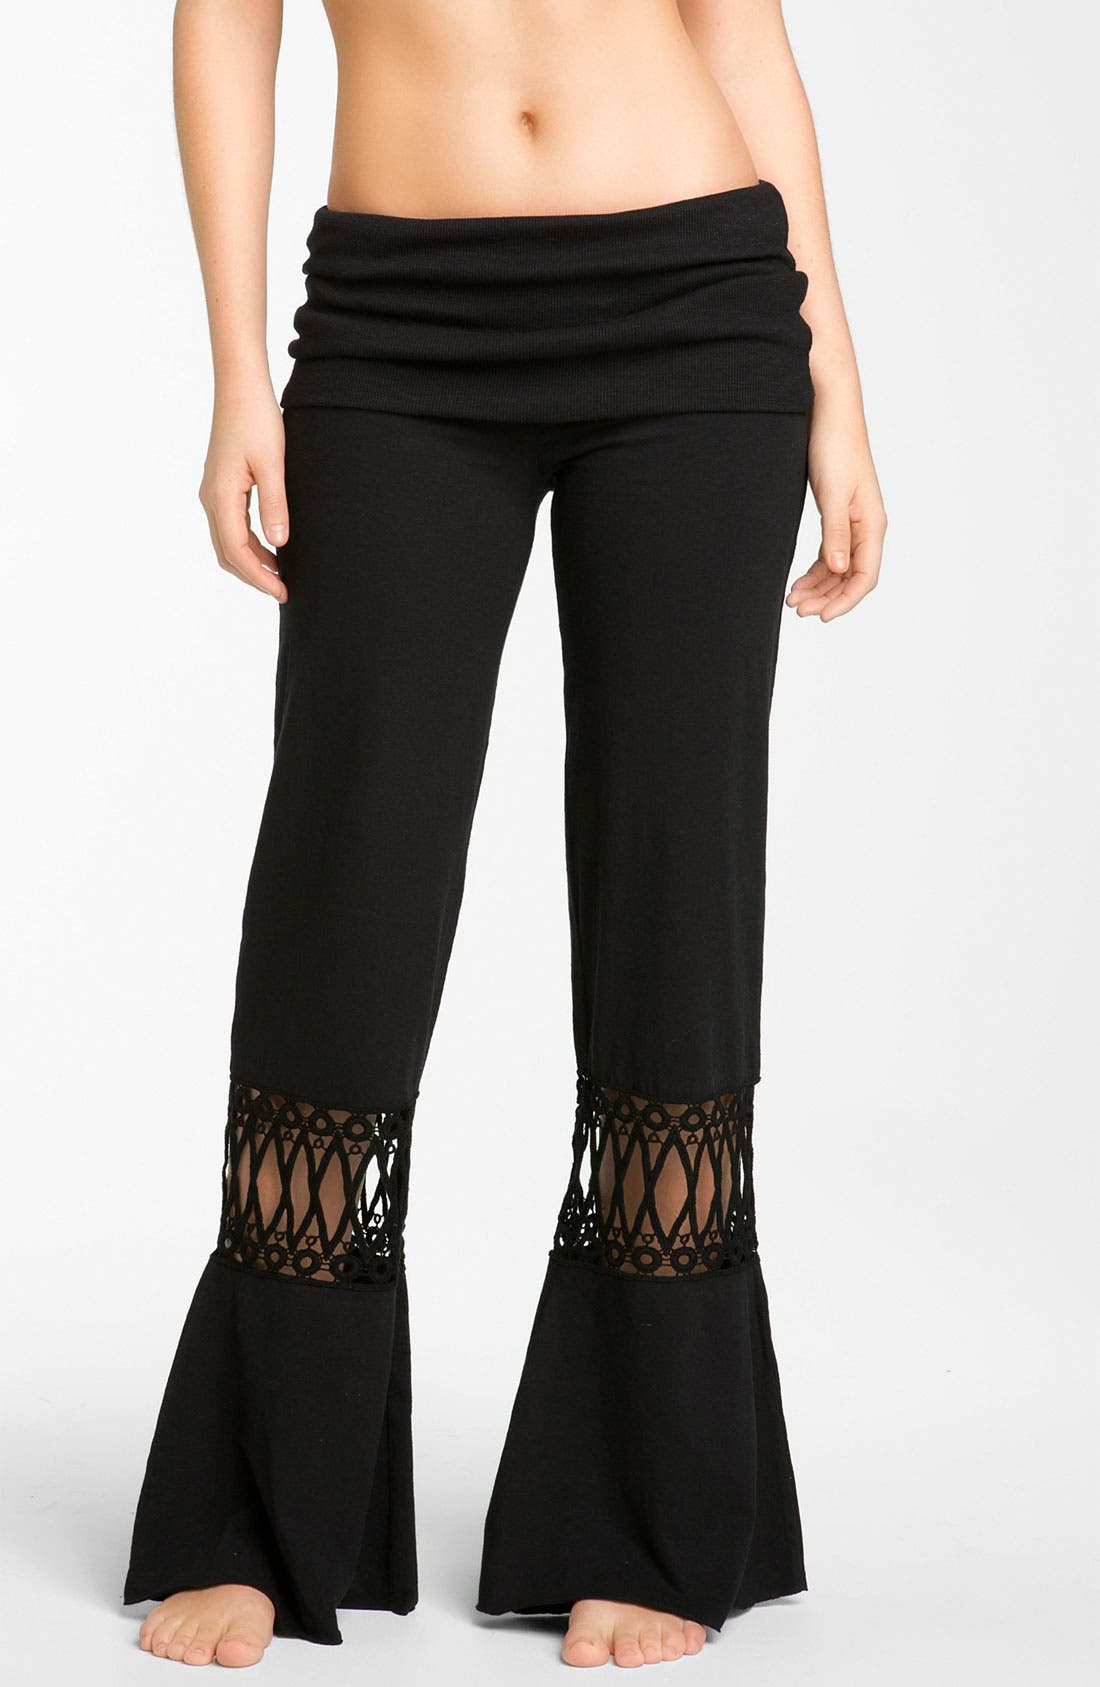 Main Image - prAna 'Malibu' Crochet Detail Knit Pants